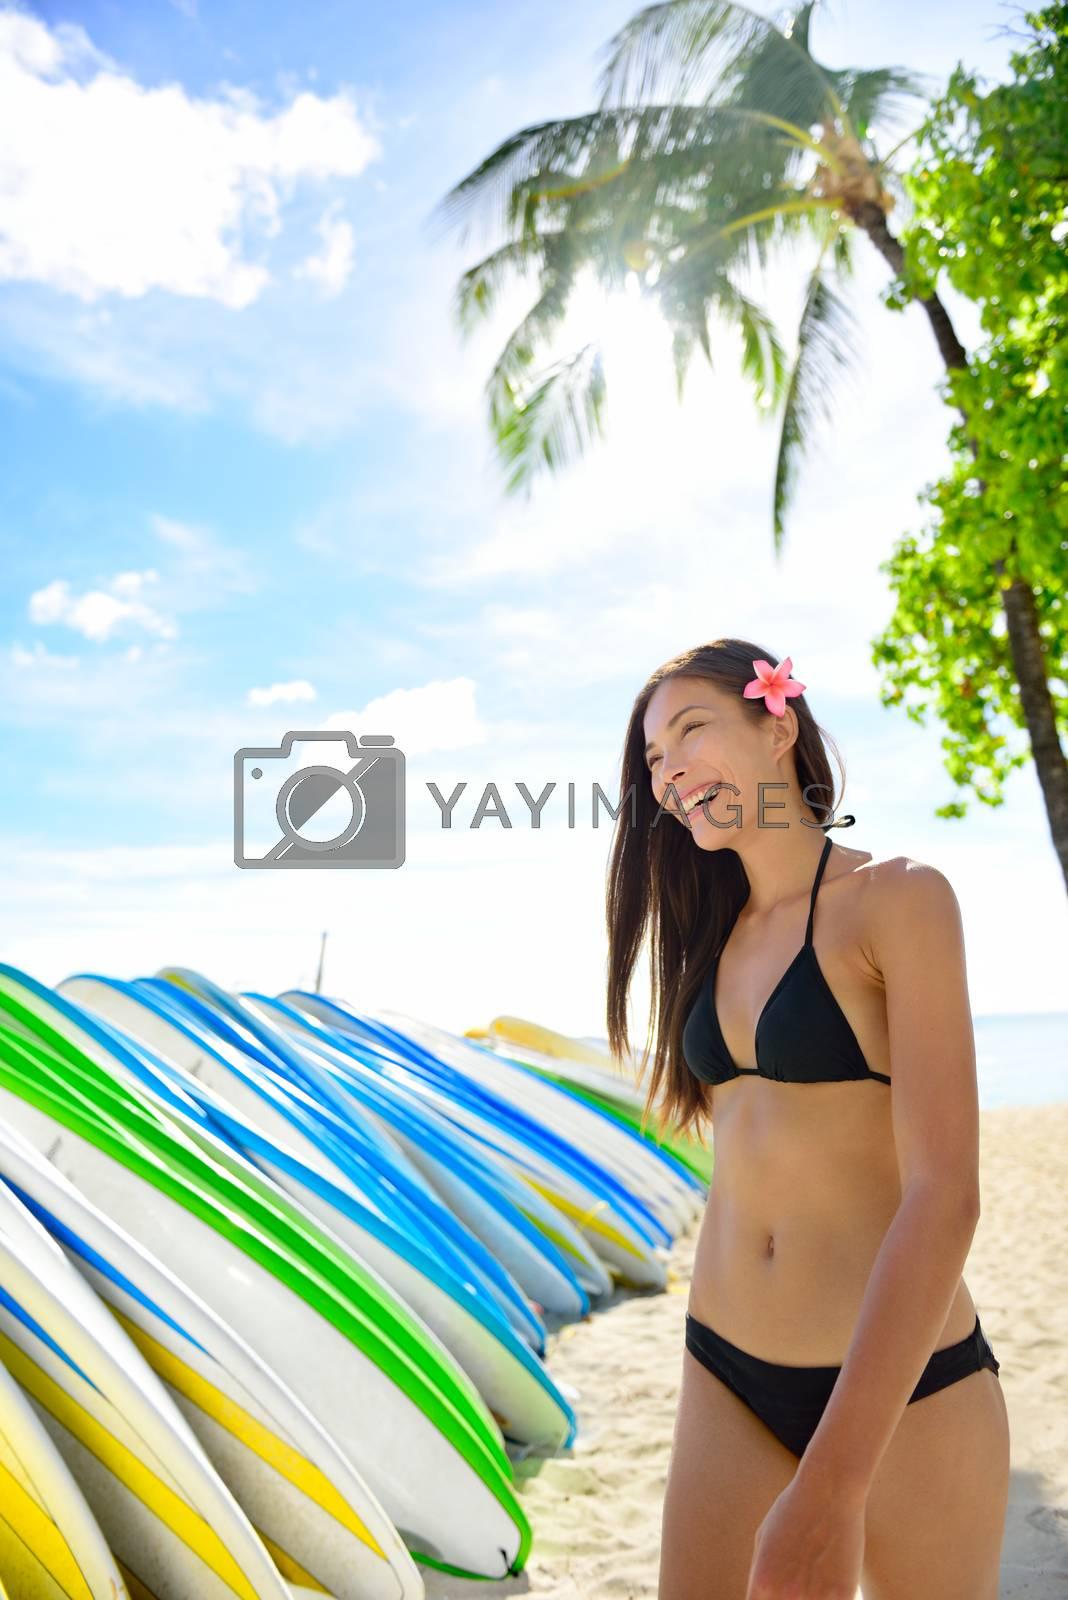 Bikini beach woman at surfboard rental surf shop. Happy Asian girl walking next to rack of many surf boards to rent for surf class on famous Waikiki beach, Honolulu City, Oahu, Hawaii, USA.